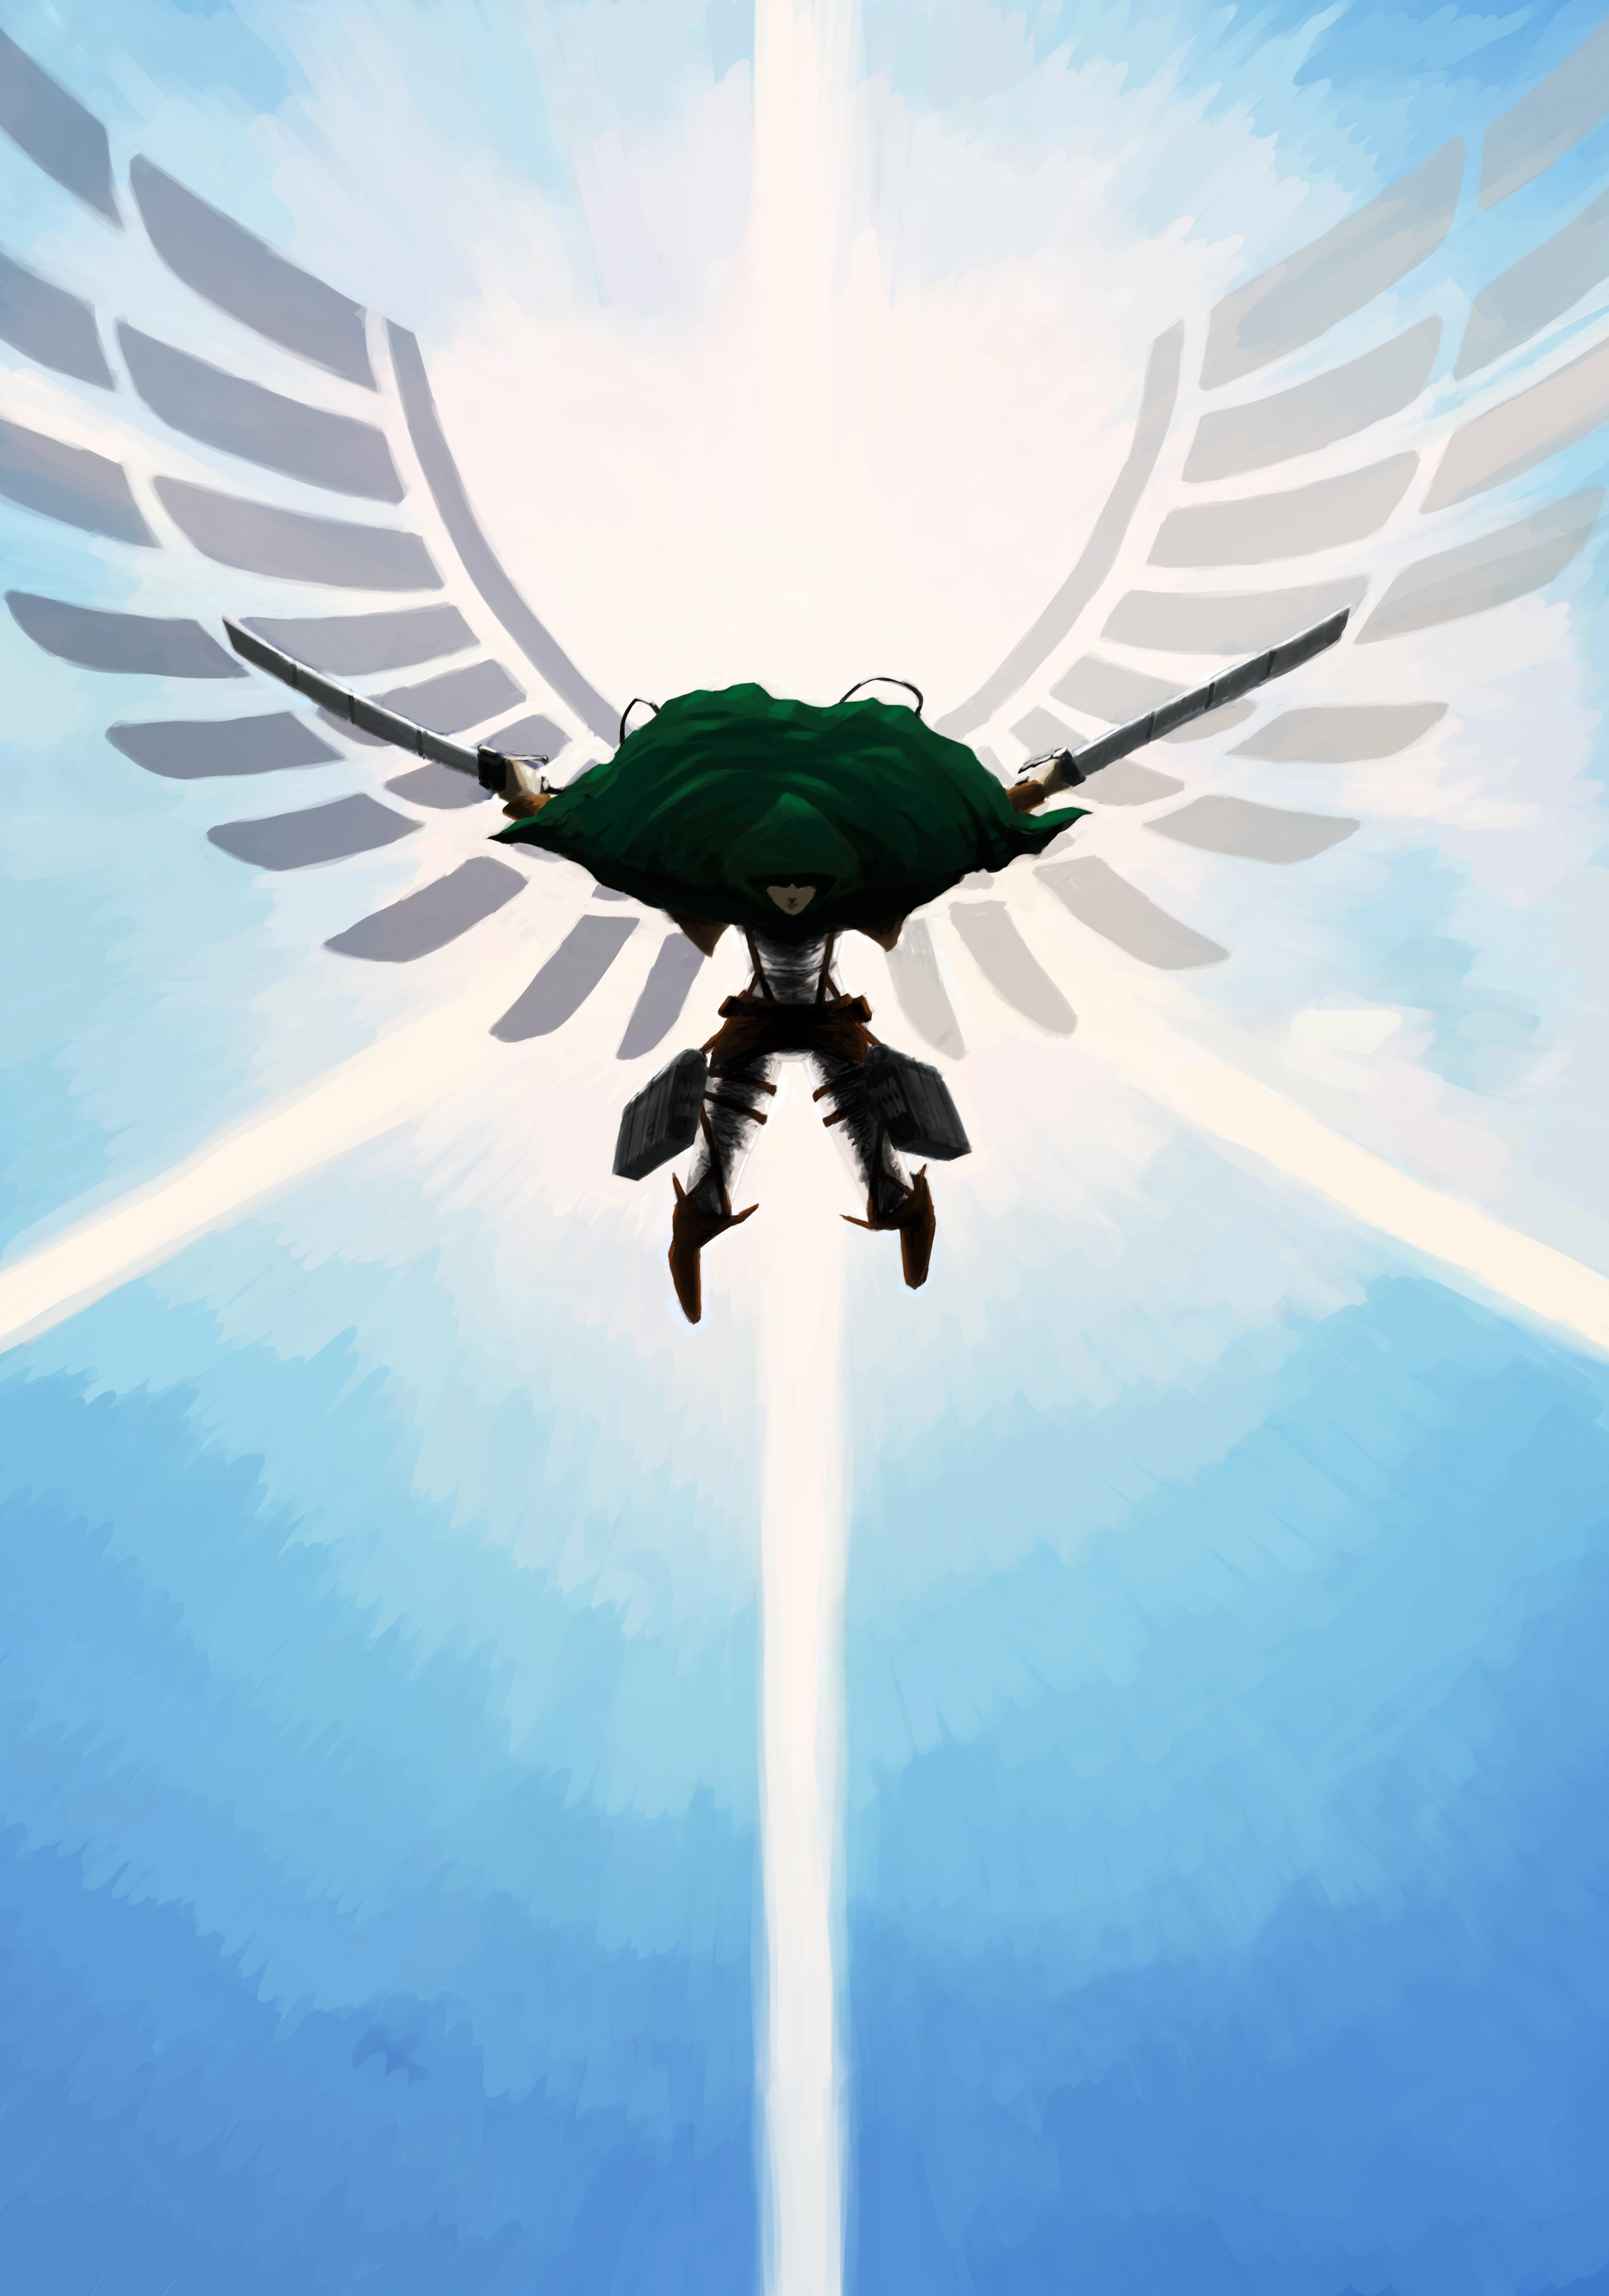 Scouting Legion By K80soccer On Deviantart